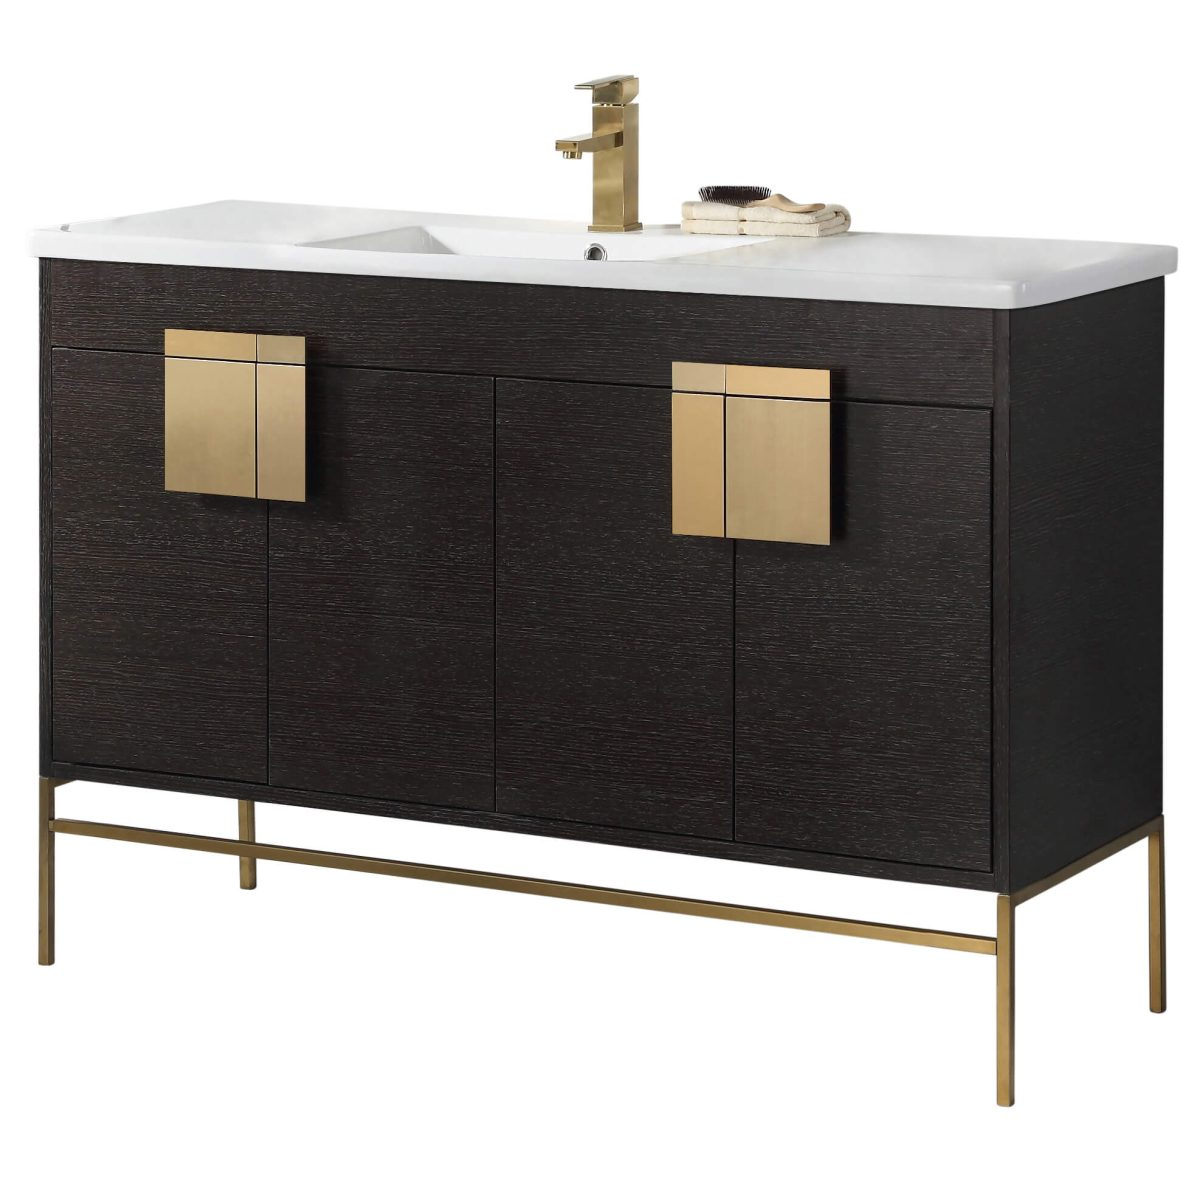 "Shawbridge 48"" Modern Single Bathroom Vanity  Black Oak Straight Grain with Satin Brass Hardware"